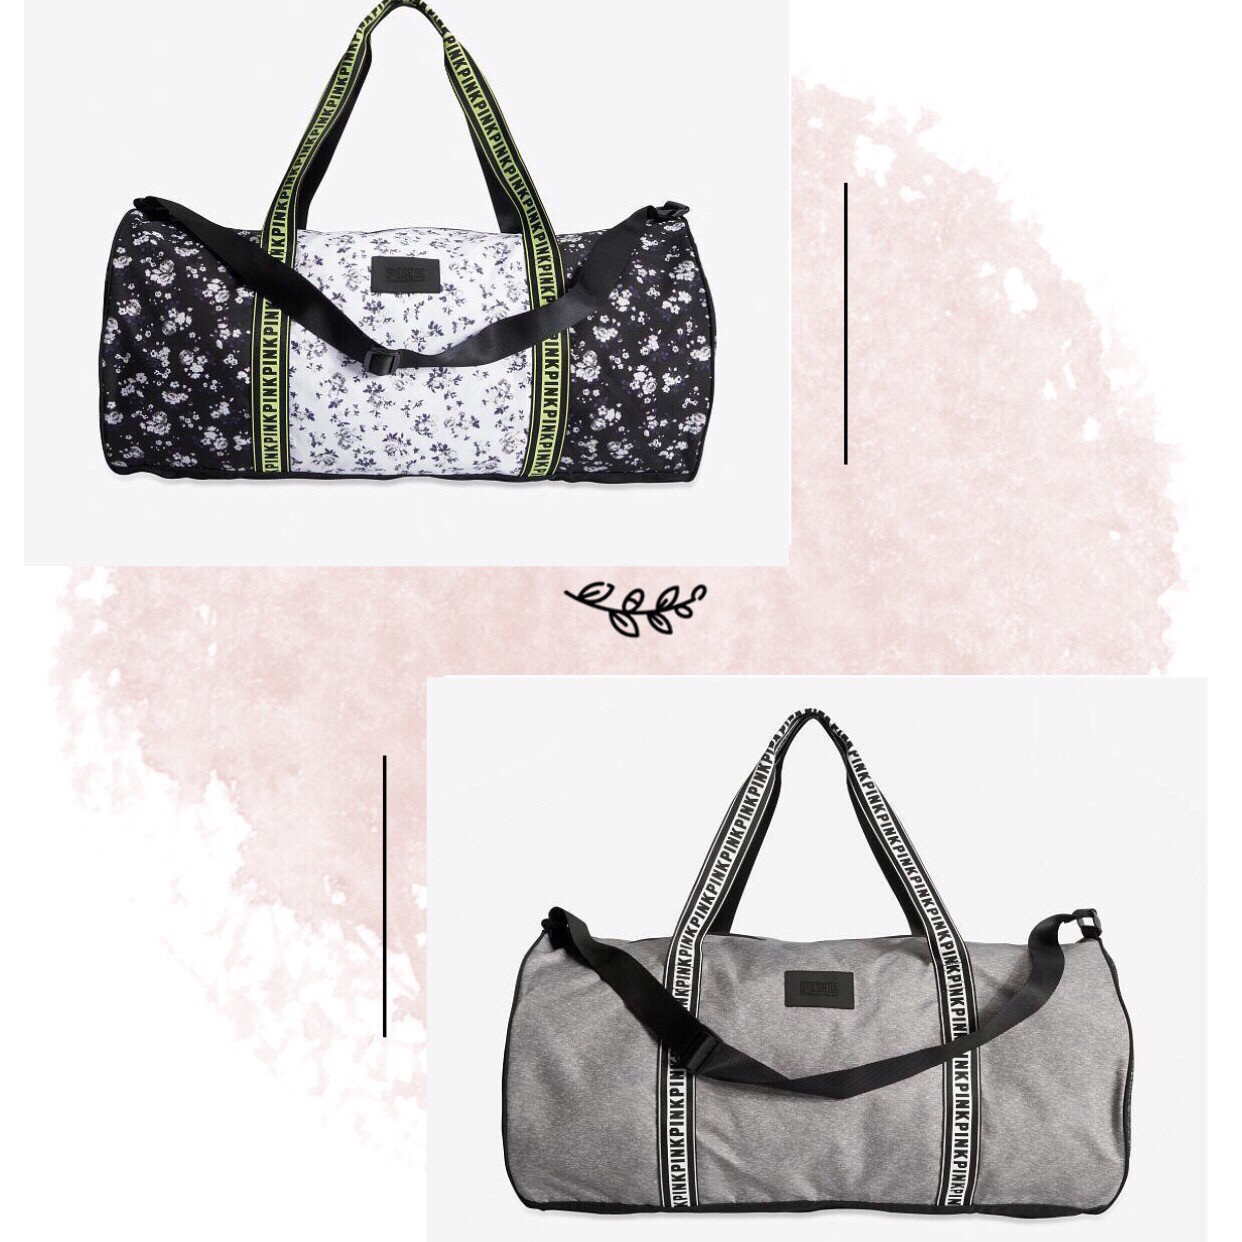 937ba76c2ba8 Спортивная сумка Pink Victoria's Secret: продажа, цена в Киеве ...